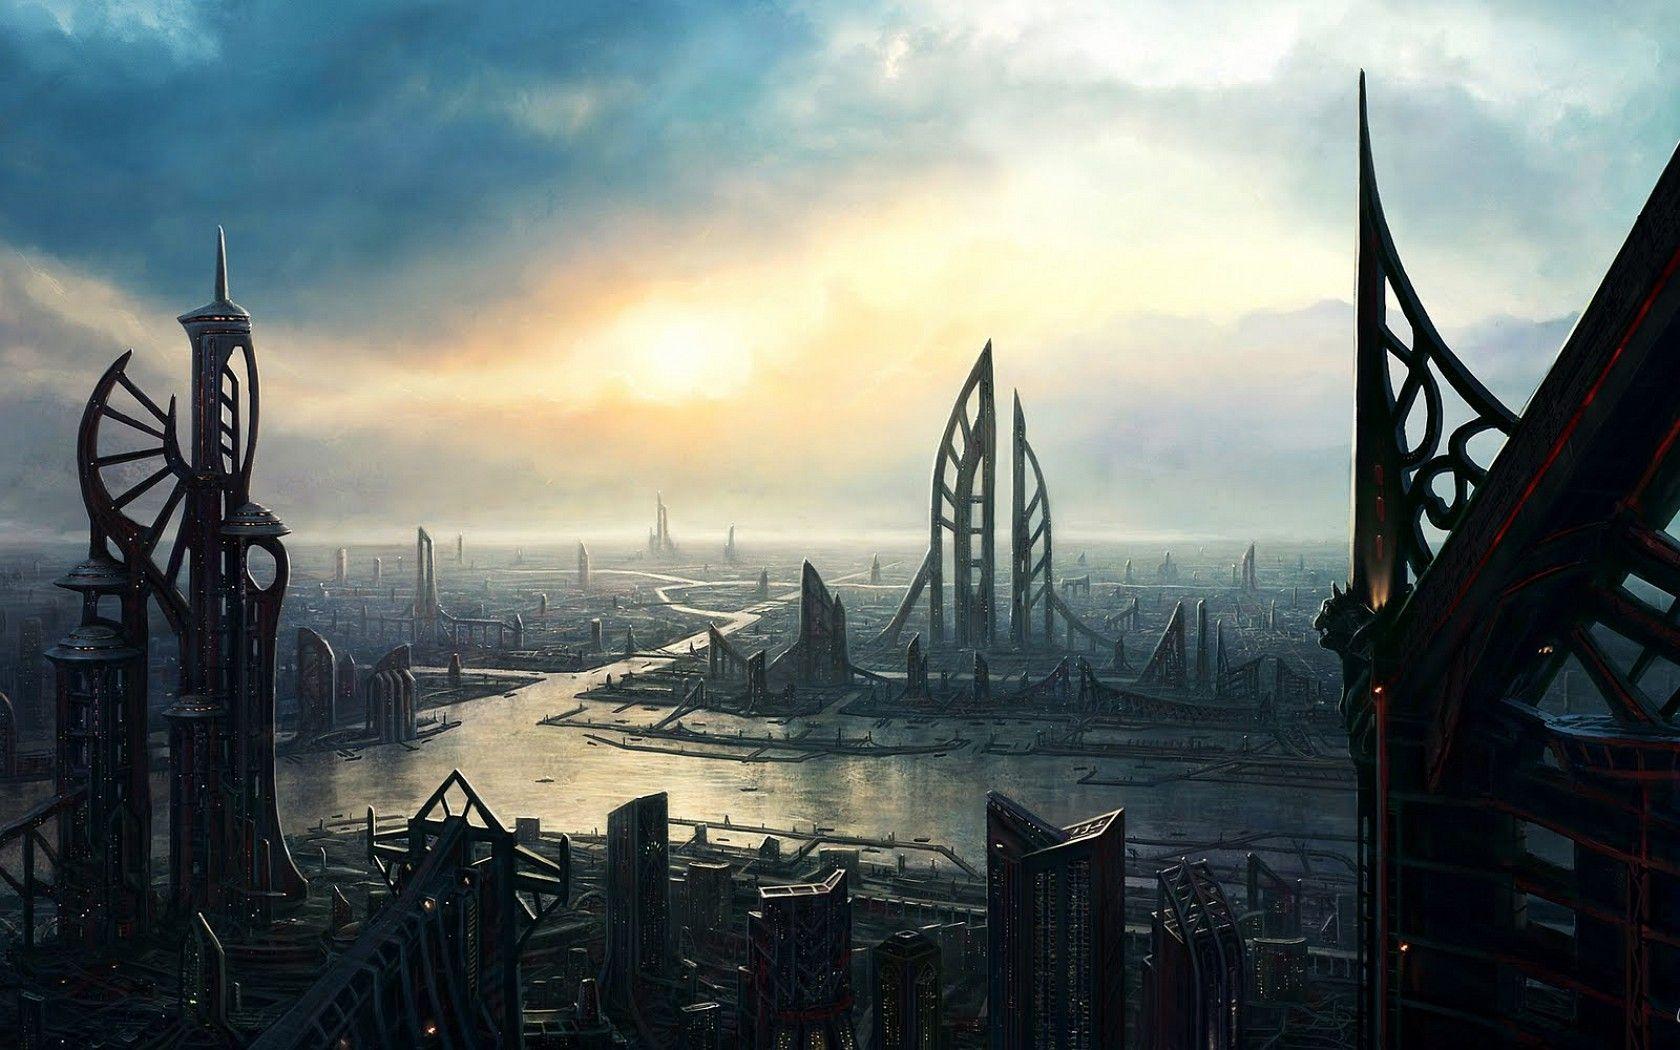 ScifiCities